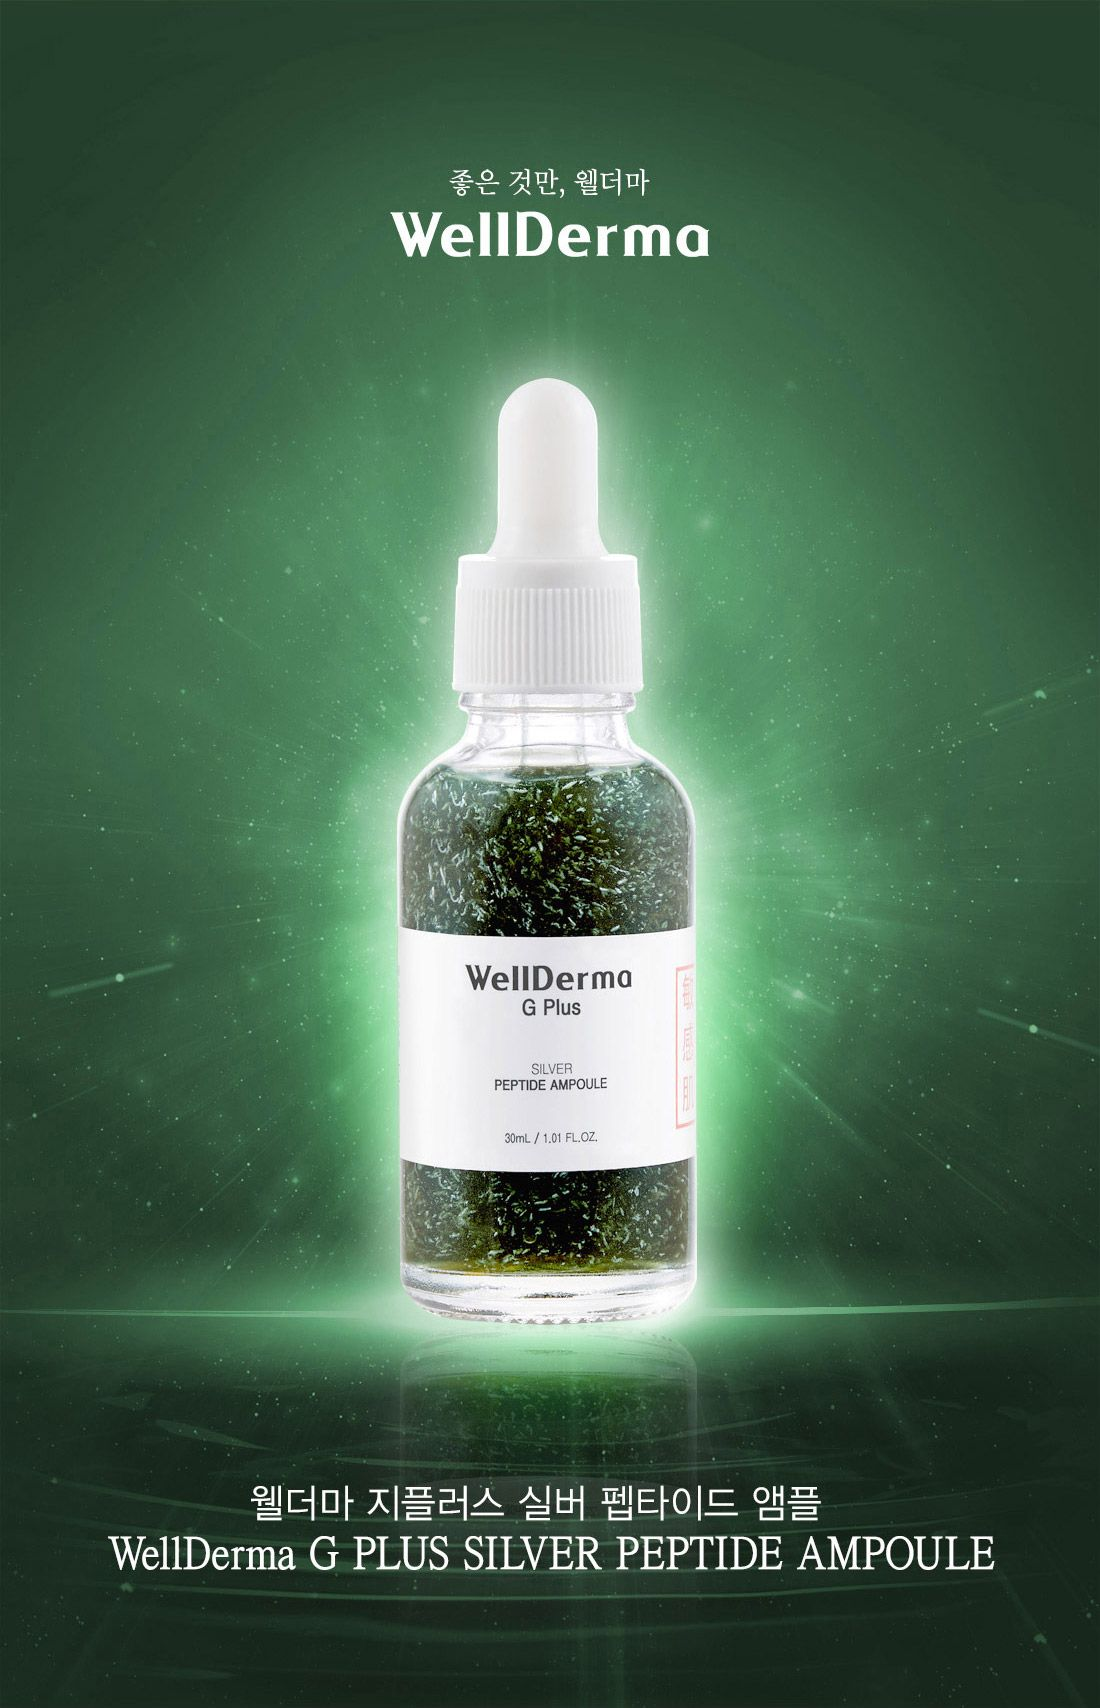 Wellderma G Plus Silver Peptide Ampoule 30 ml